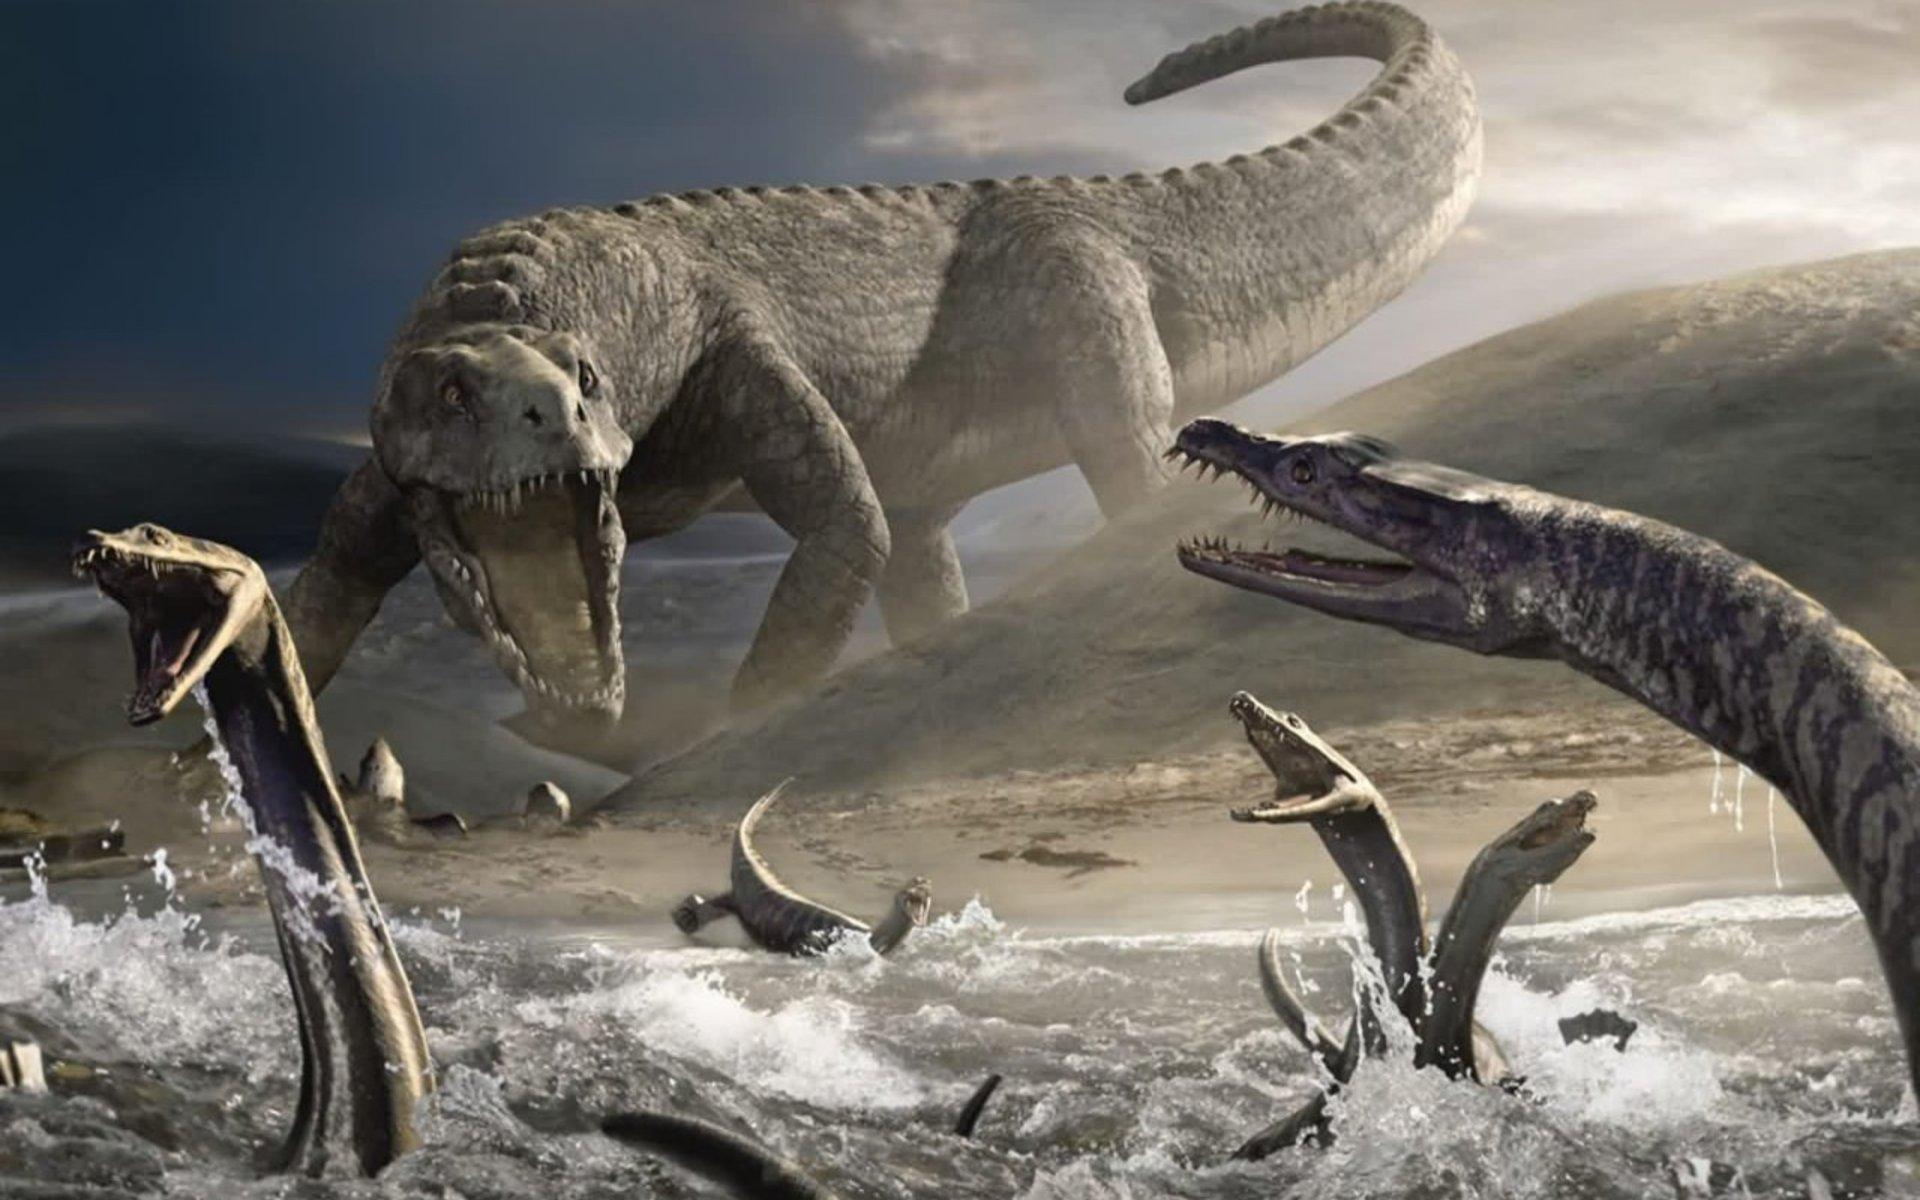 Как на земле появились динозавры, как появились динозавры на земле